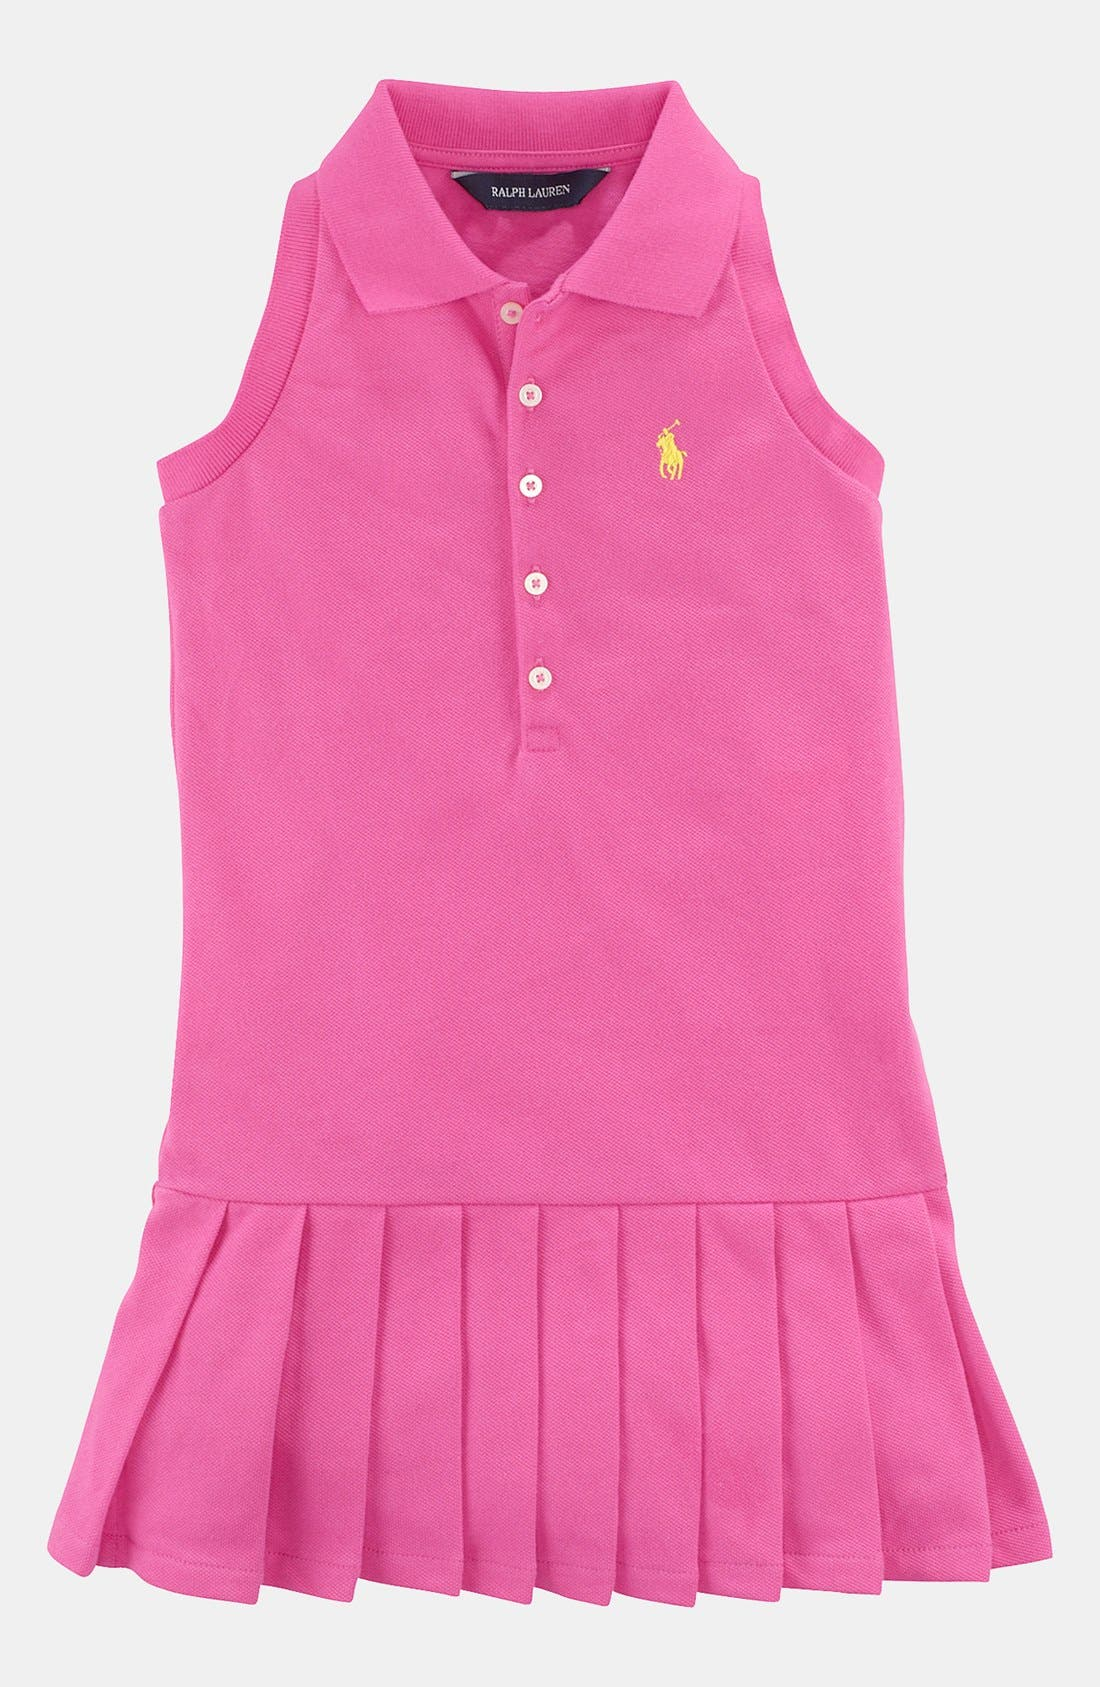 Alternate Image 1 Selected - Ralph Lauren Pleated Polo Dress (Toddler)